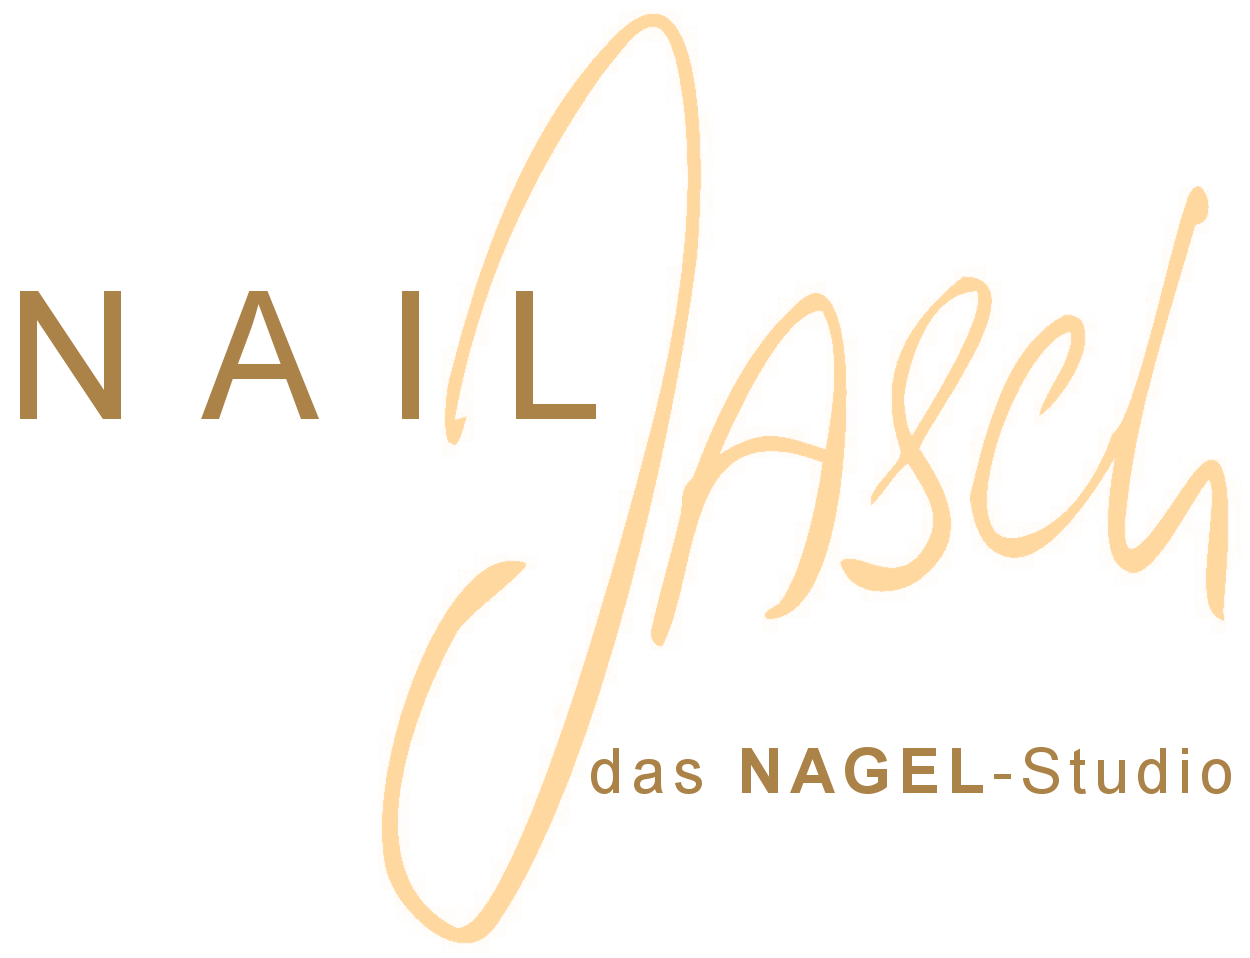 nailJASCH - das NAGEL-Studio